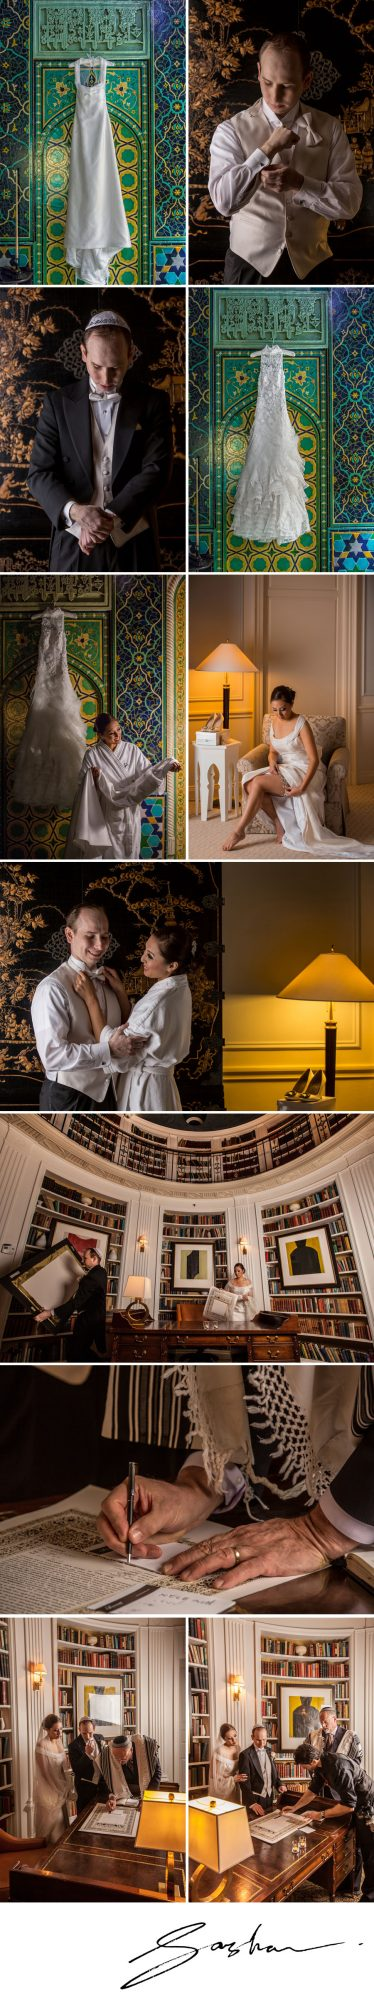 fairmont hotel san francisco wedding